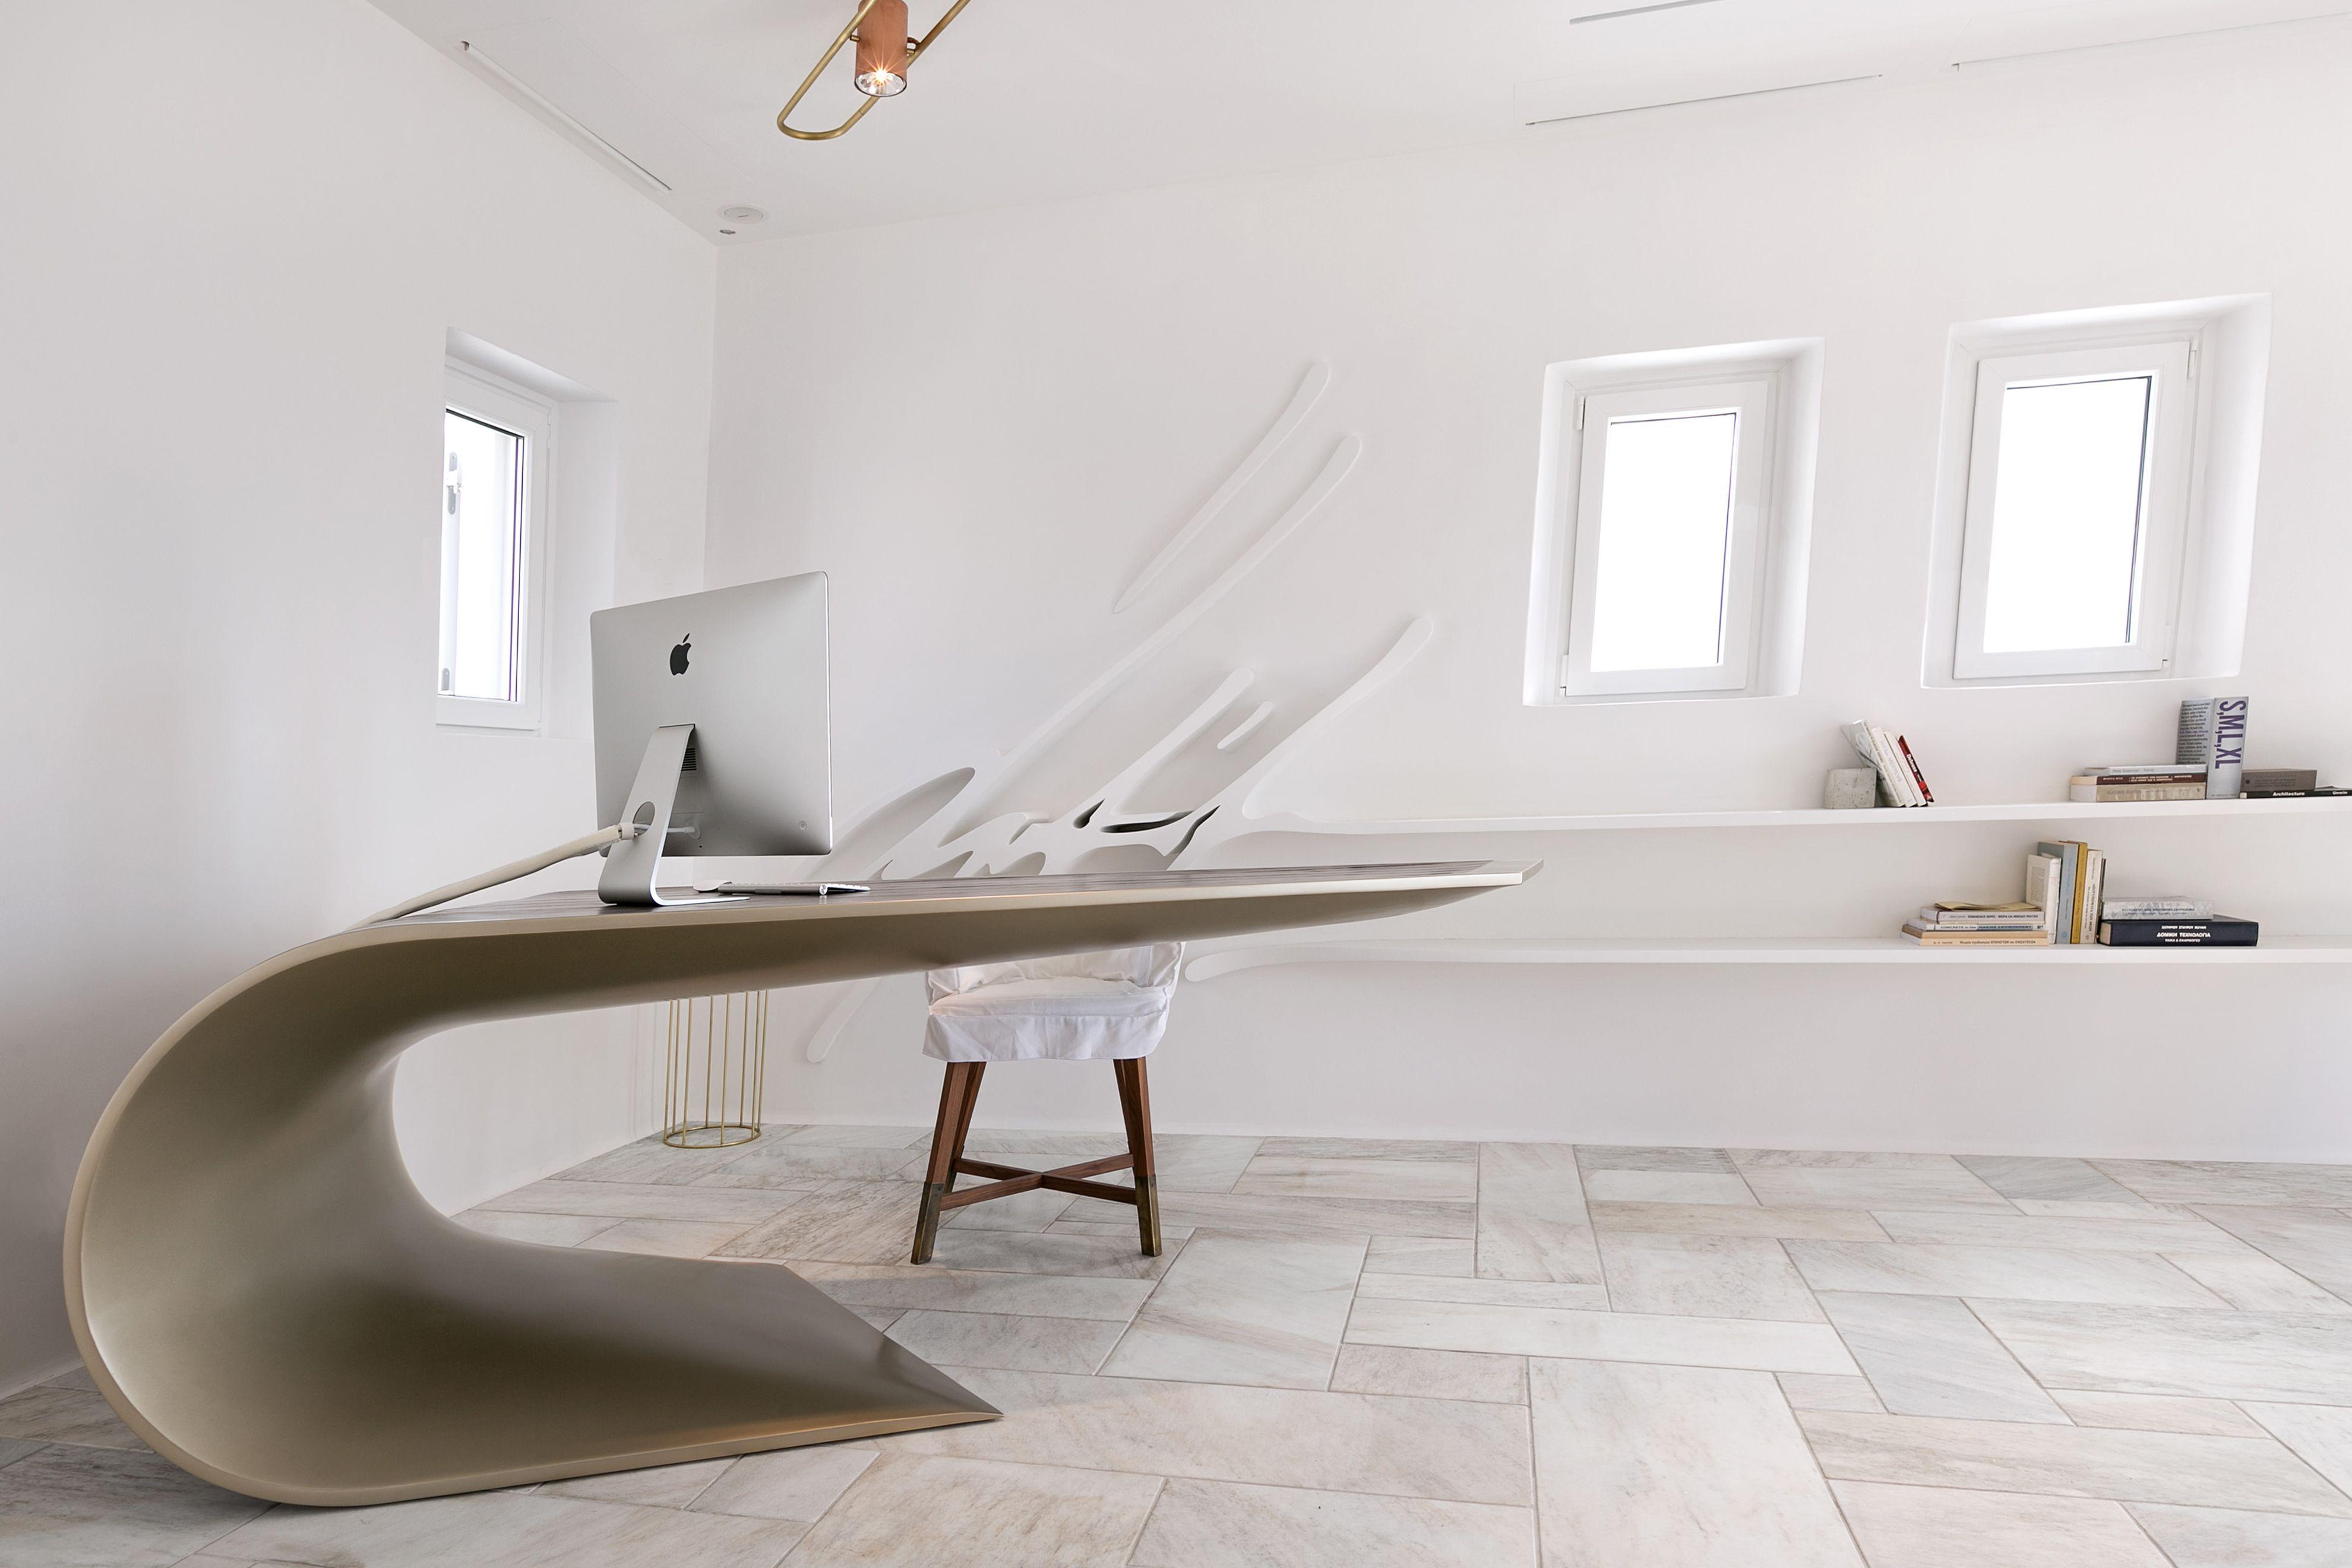 Mykonos Office Design Eleftherios Ambatzis Structural Engineer Spyridon Apostolou Interior Design Home Decor Interior